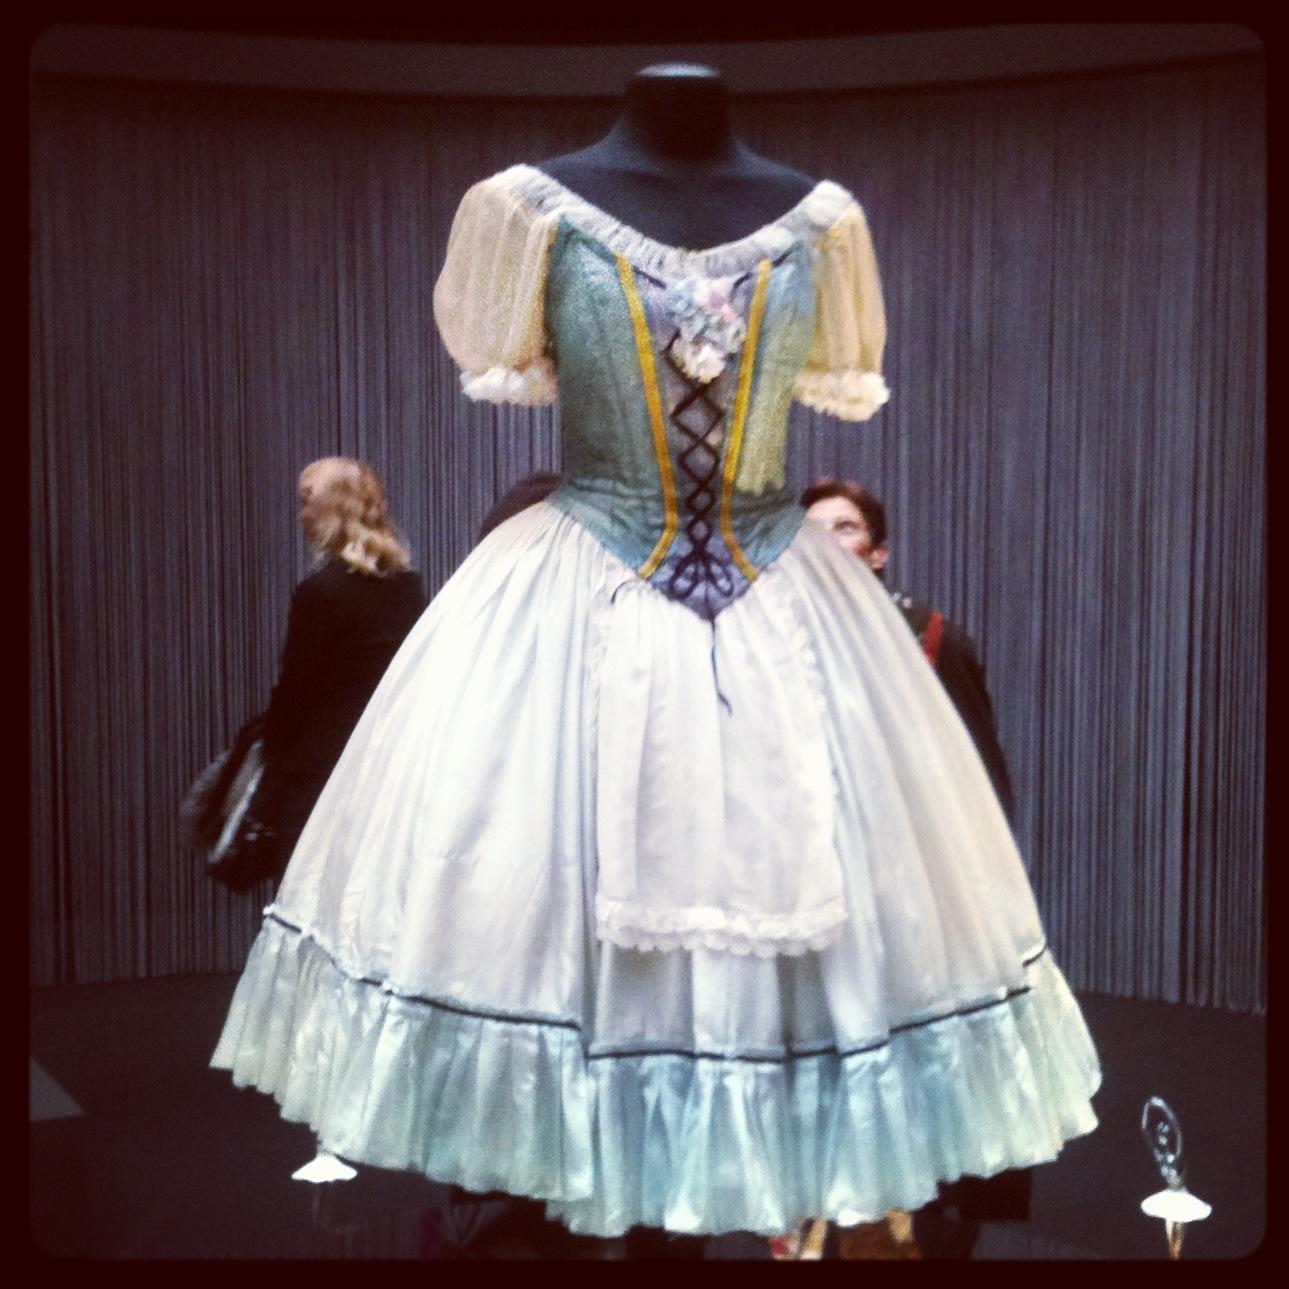 Costume de Giselle